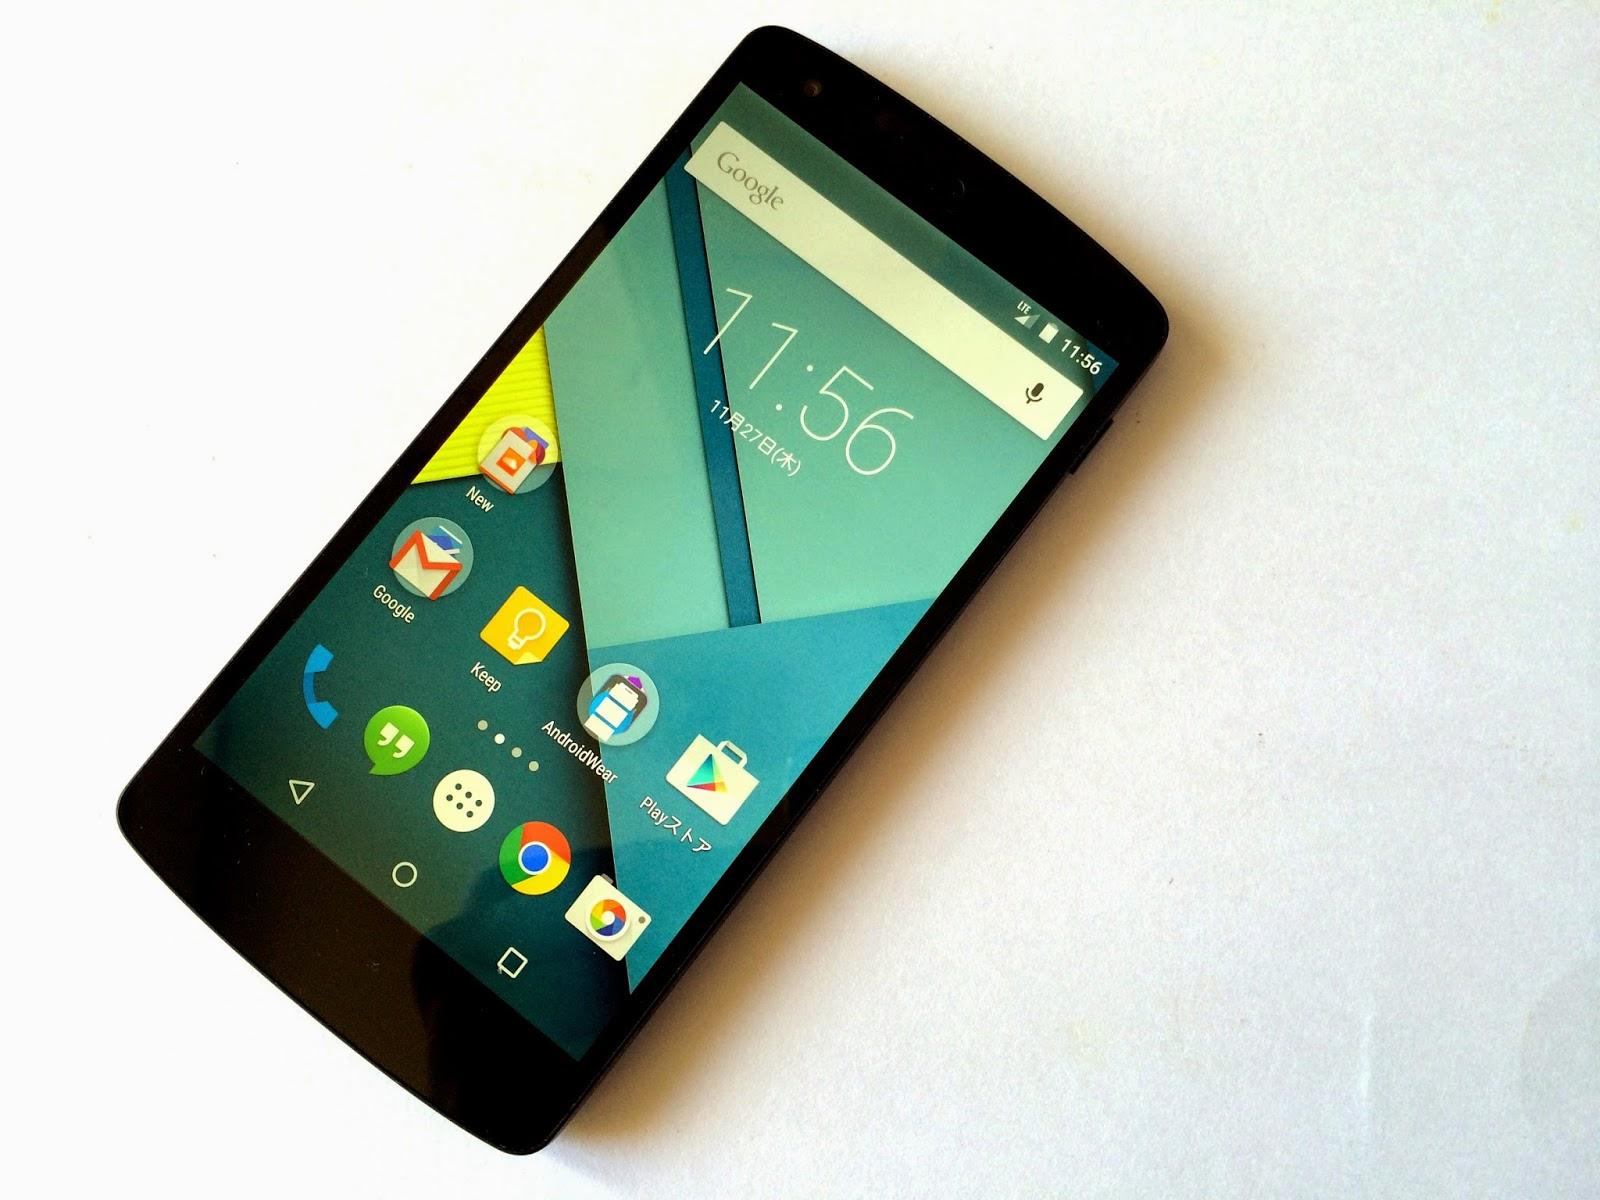 Beyond The Motor Nexus 5 Android 5 0 Lollipop の 壁紙 が